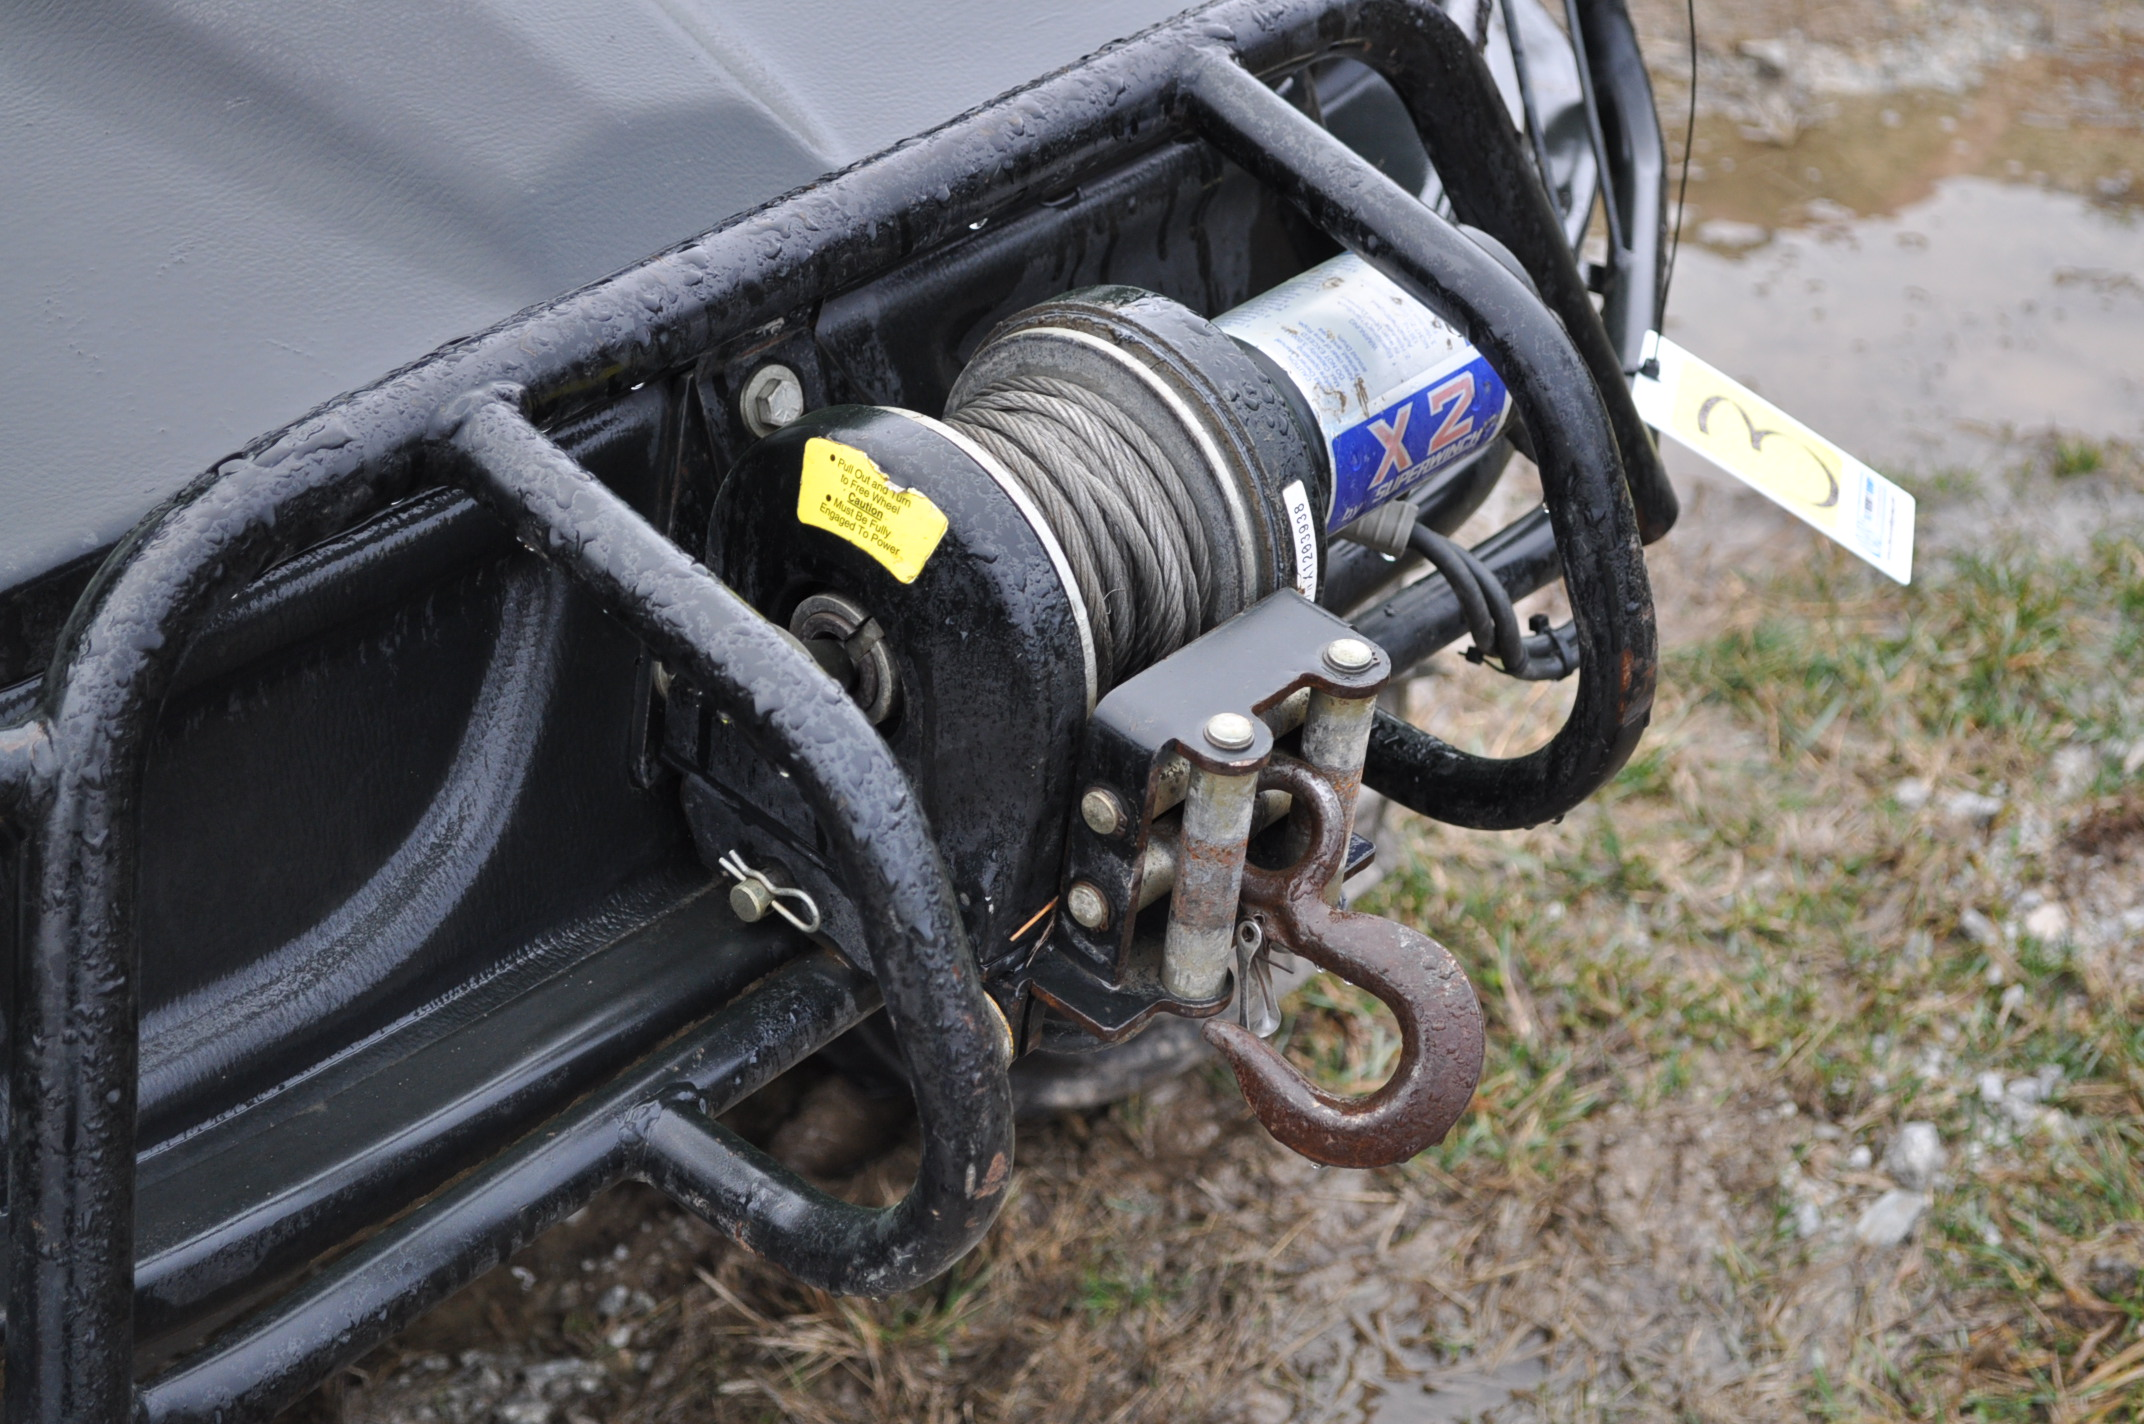 2008 Argo Frontier 650 6x6 ATV, 24 x 10.00-8 tires, 256 hrs - Image 5 of 8